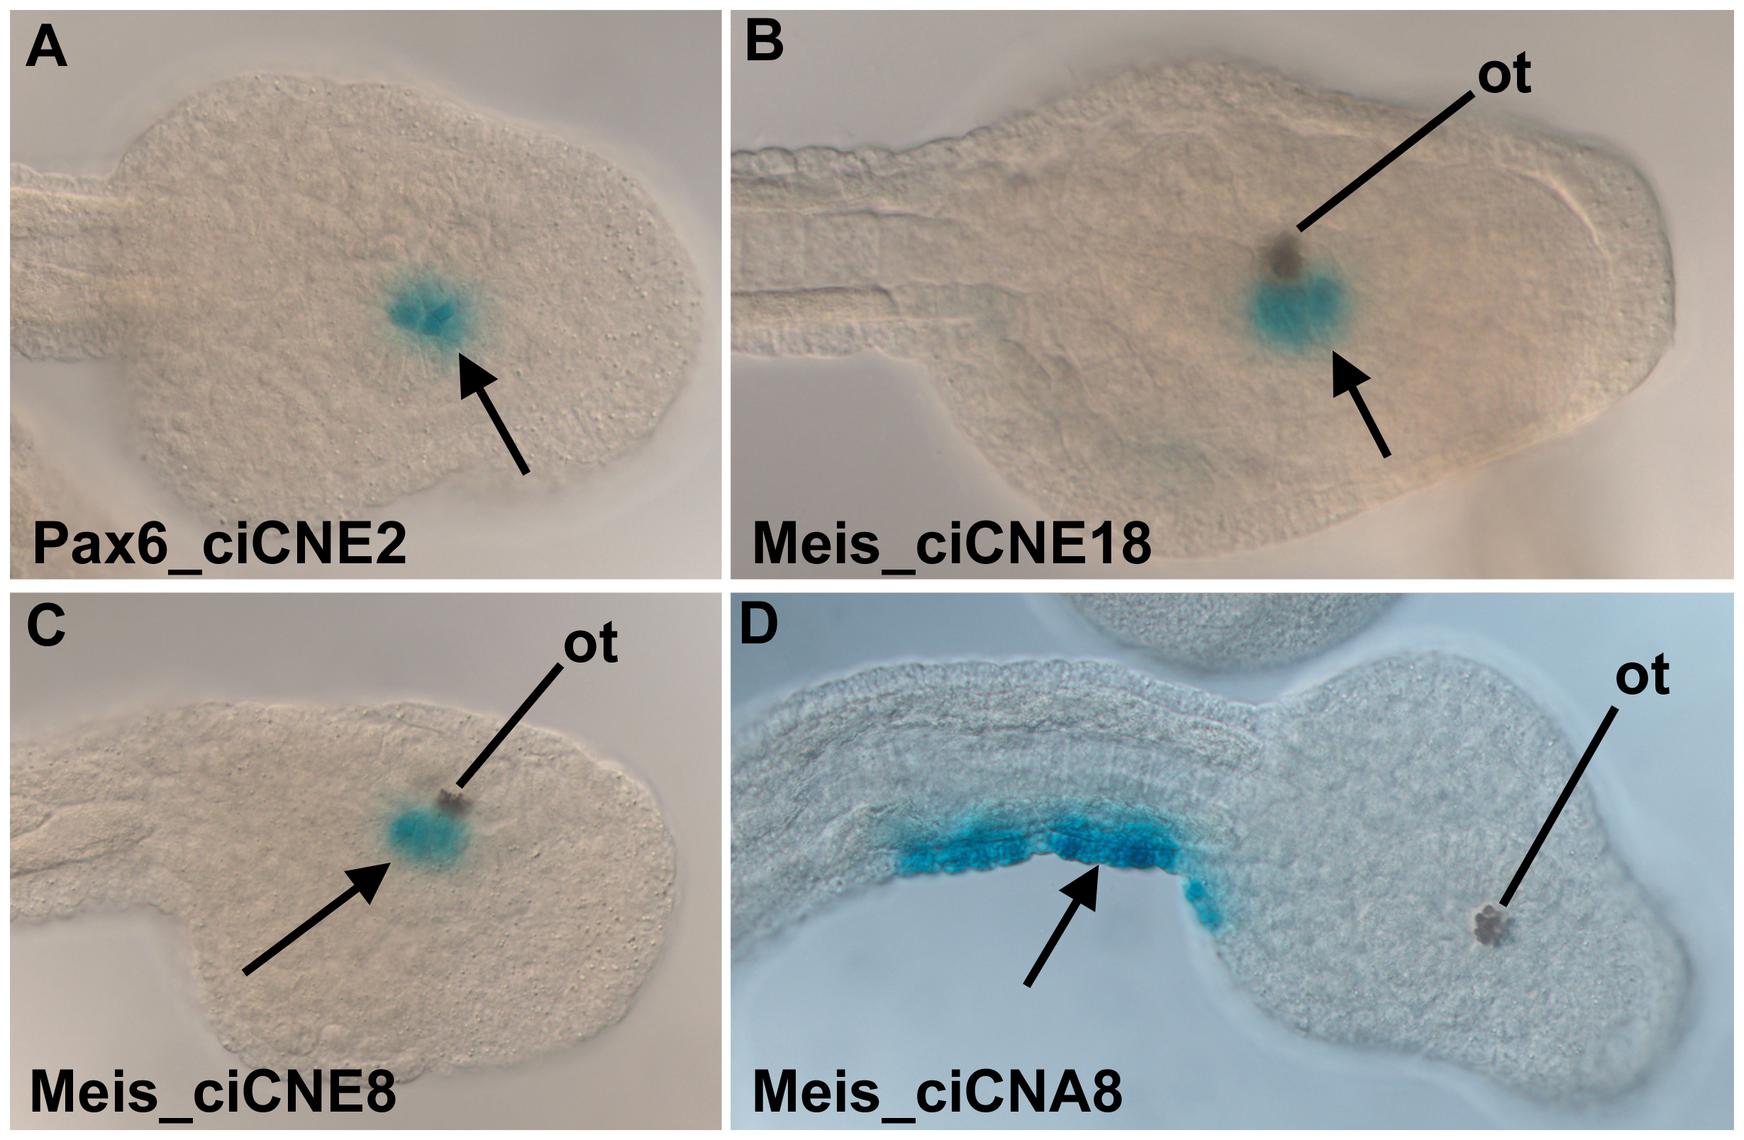 Analysis of ciCNEs in <i>C. intestinalis</i> embryos.